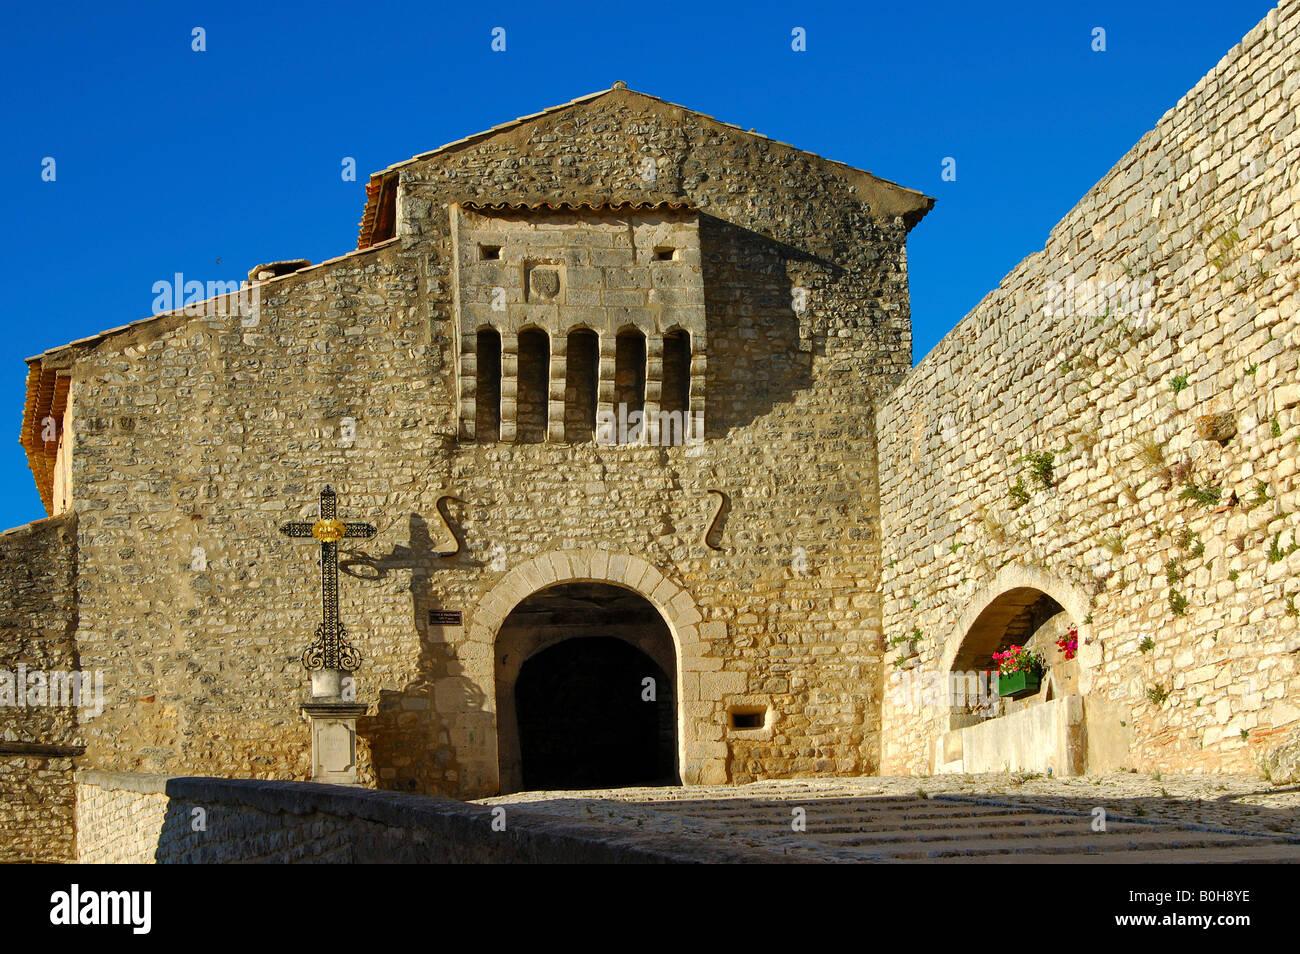 Gate, fourteenth-century city walls, Banon, Provence, France - Stock Image